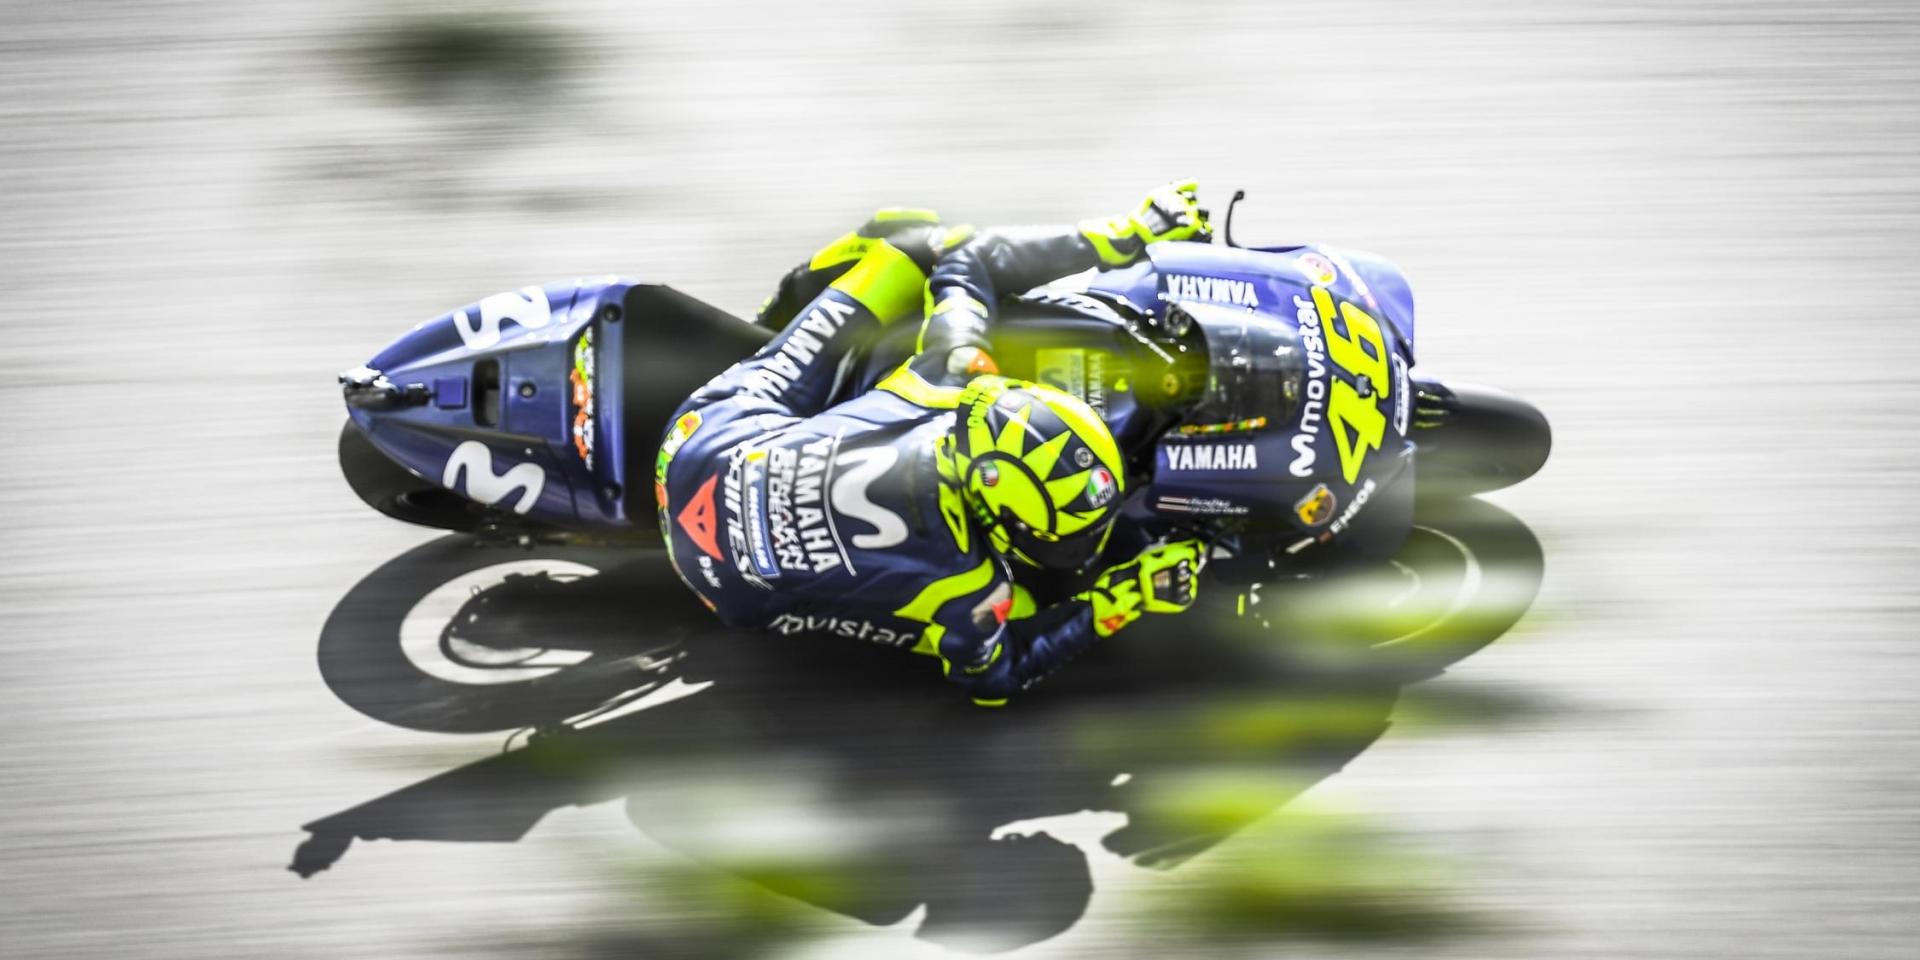 YAMAHA有解?Valentino Rossi:我們找到一些東西能夠讓我們上頒獎台!